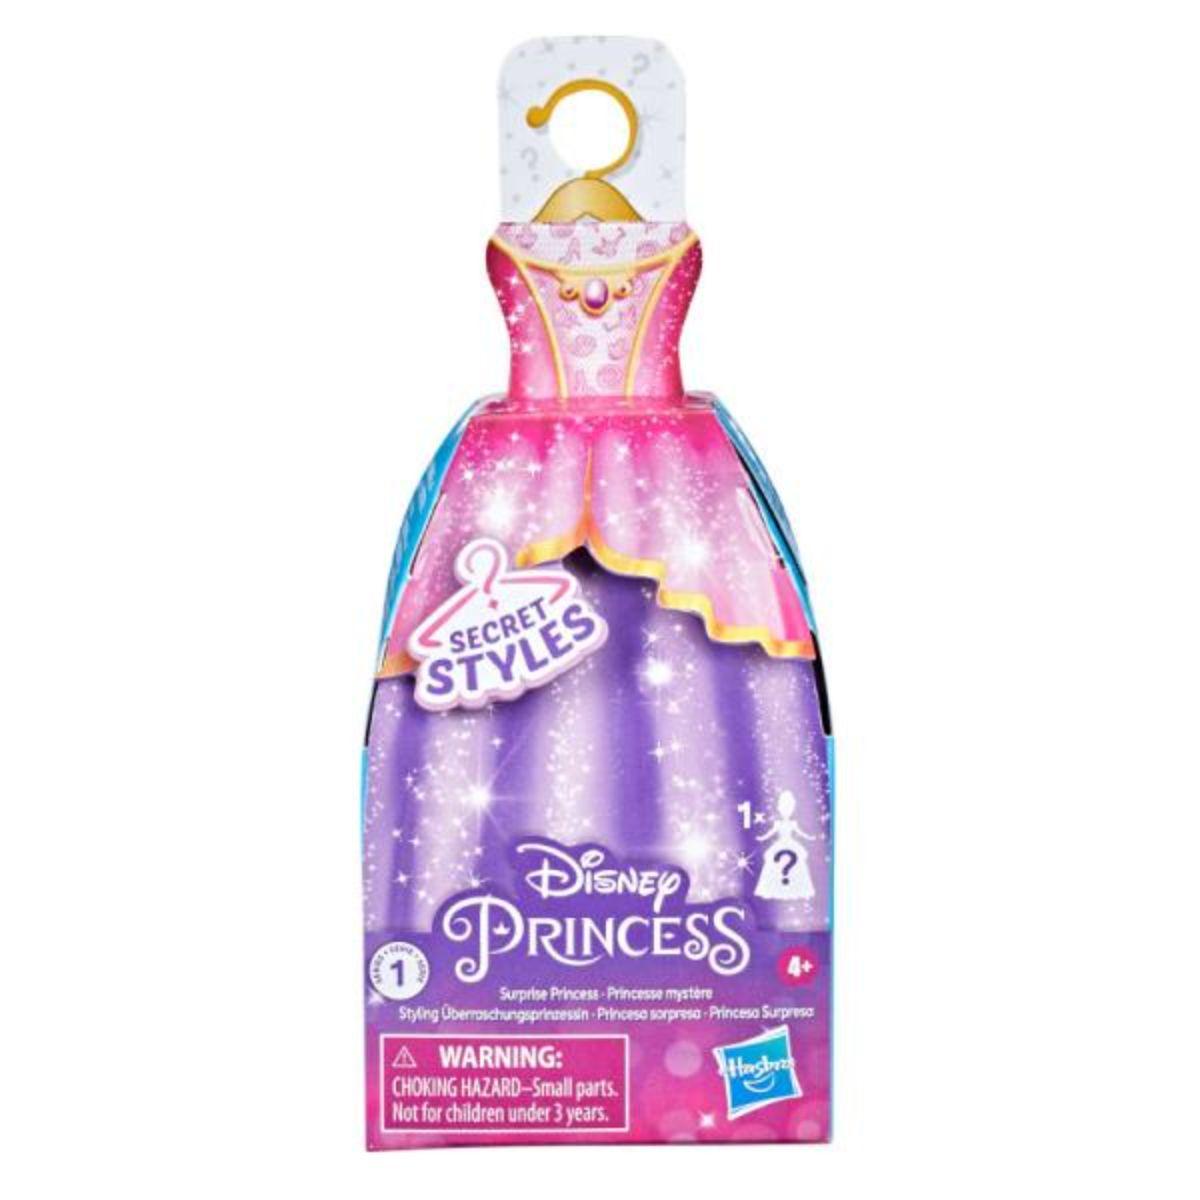 Mini-figurina surpiza, Disney Princess, Secret Styles